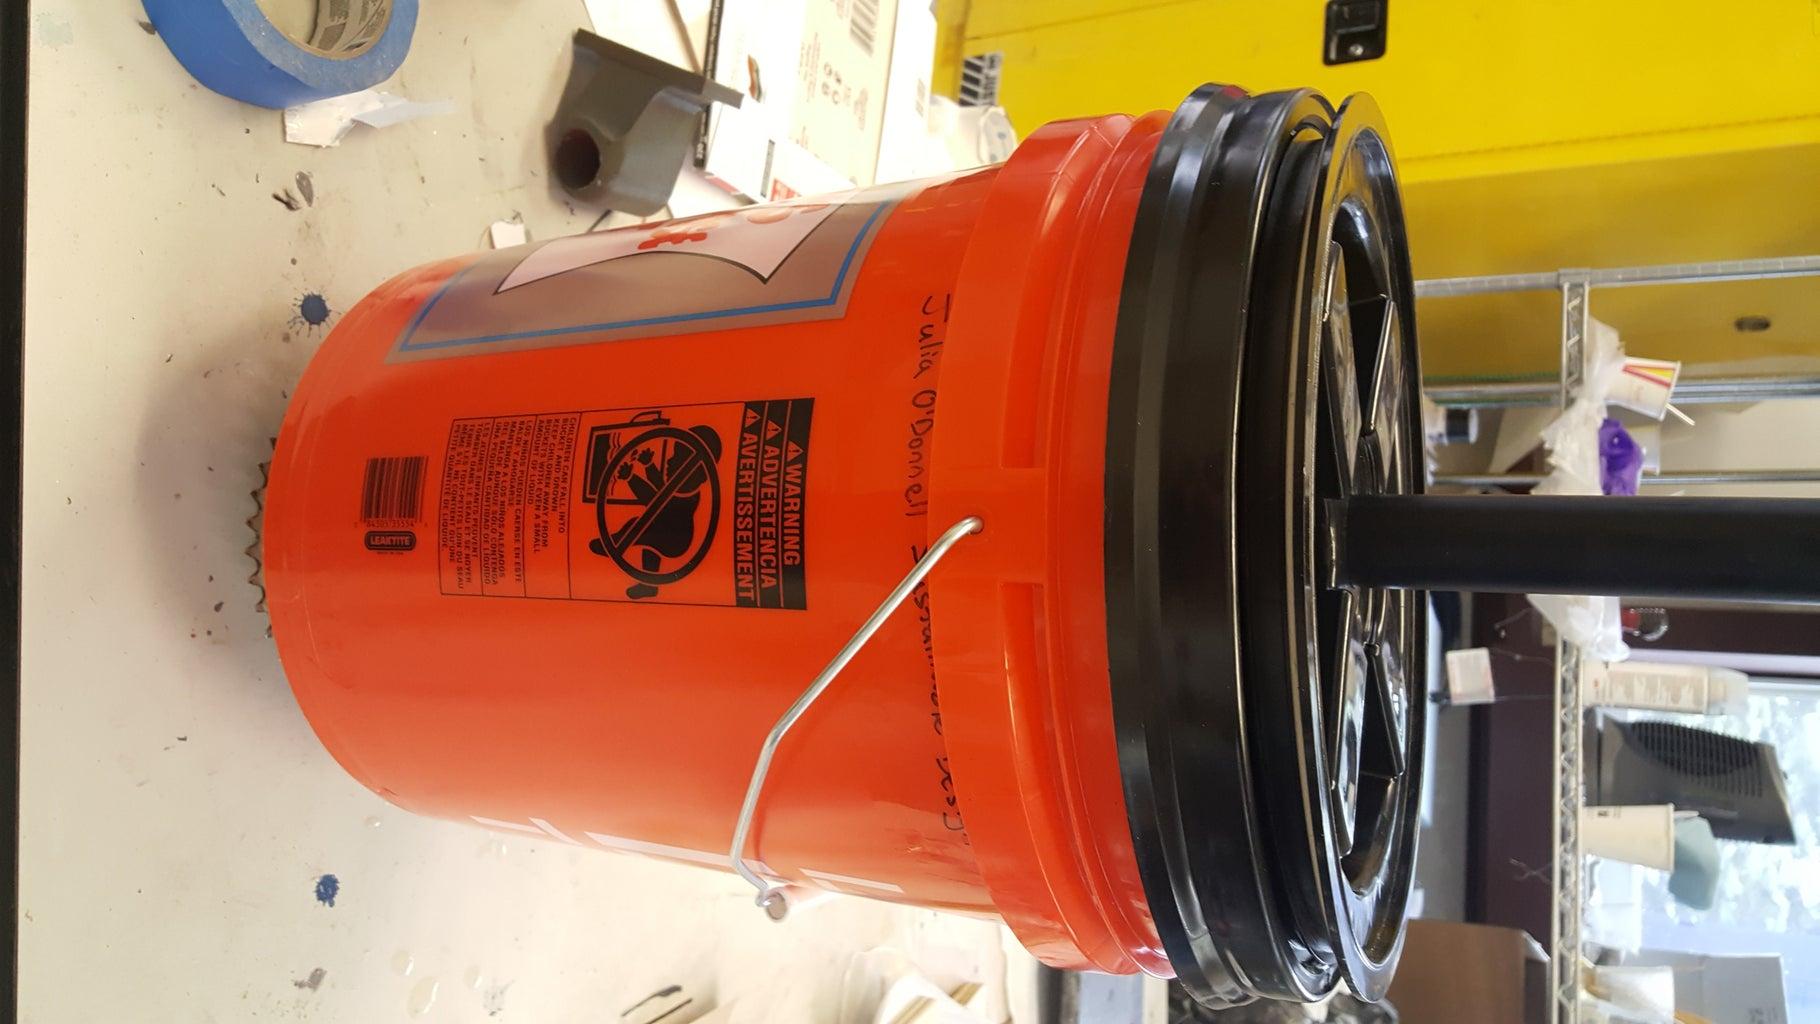 Waterproof Bucket: Lid